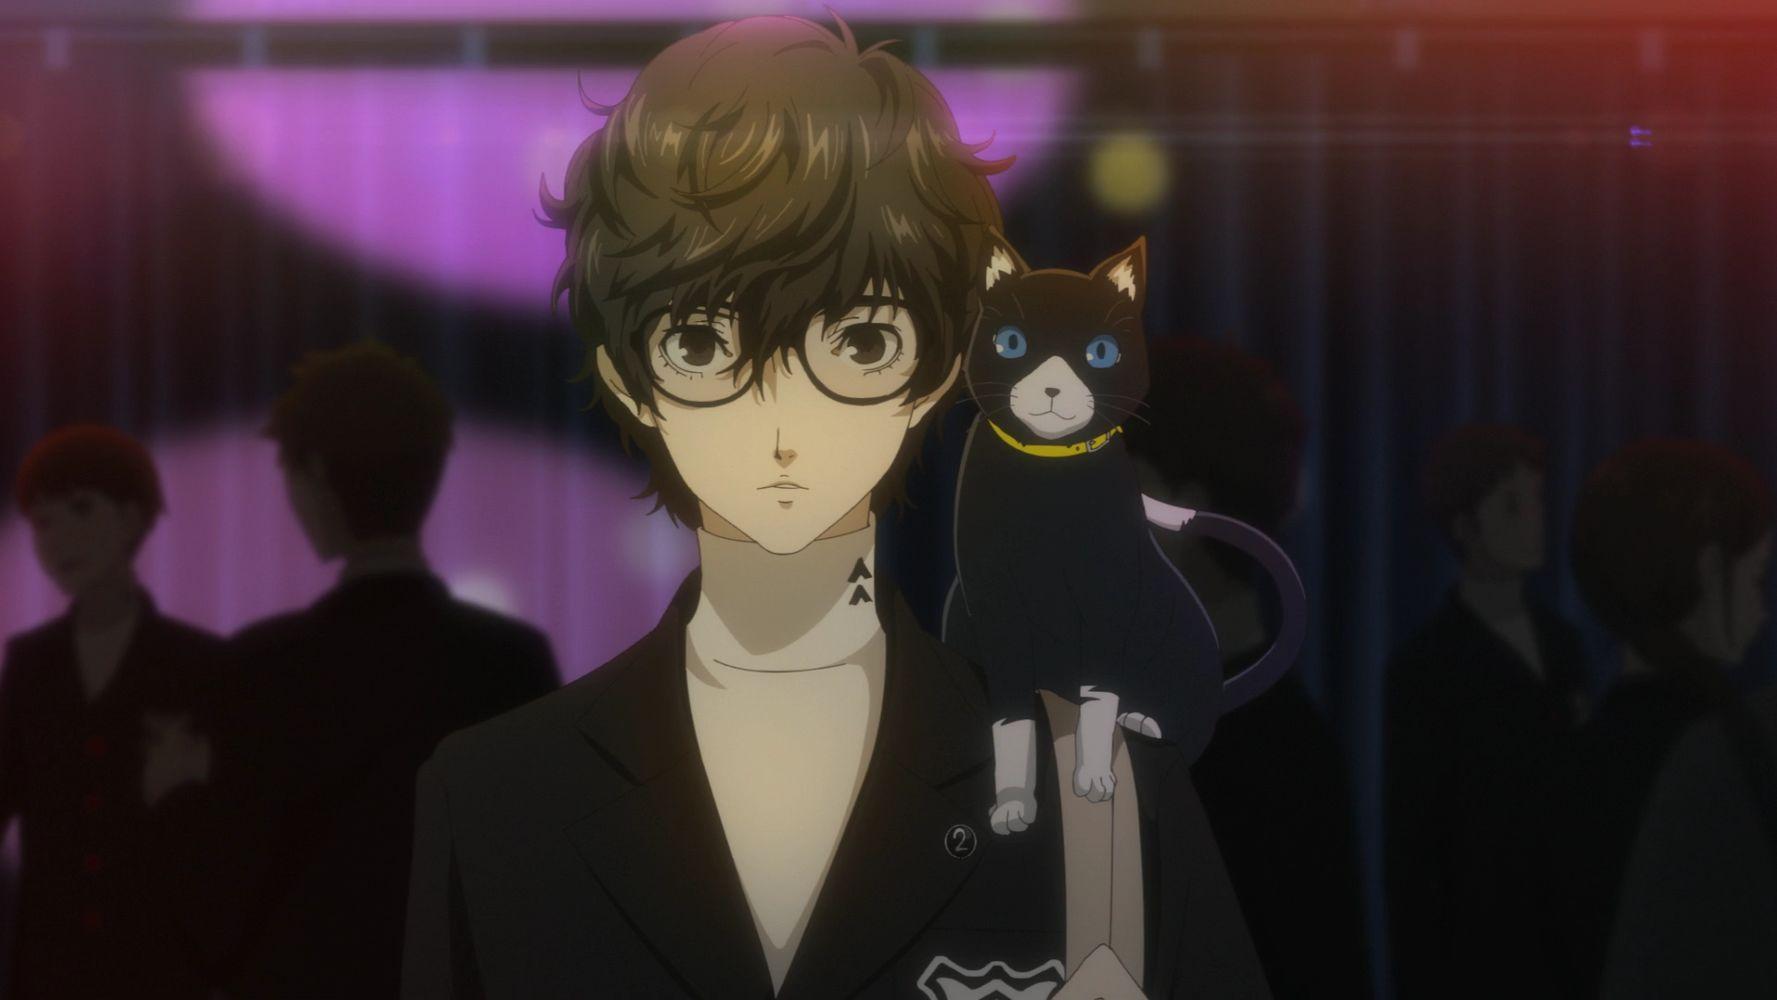 Protagonista e Morgana, Persona 5 Royal